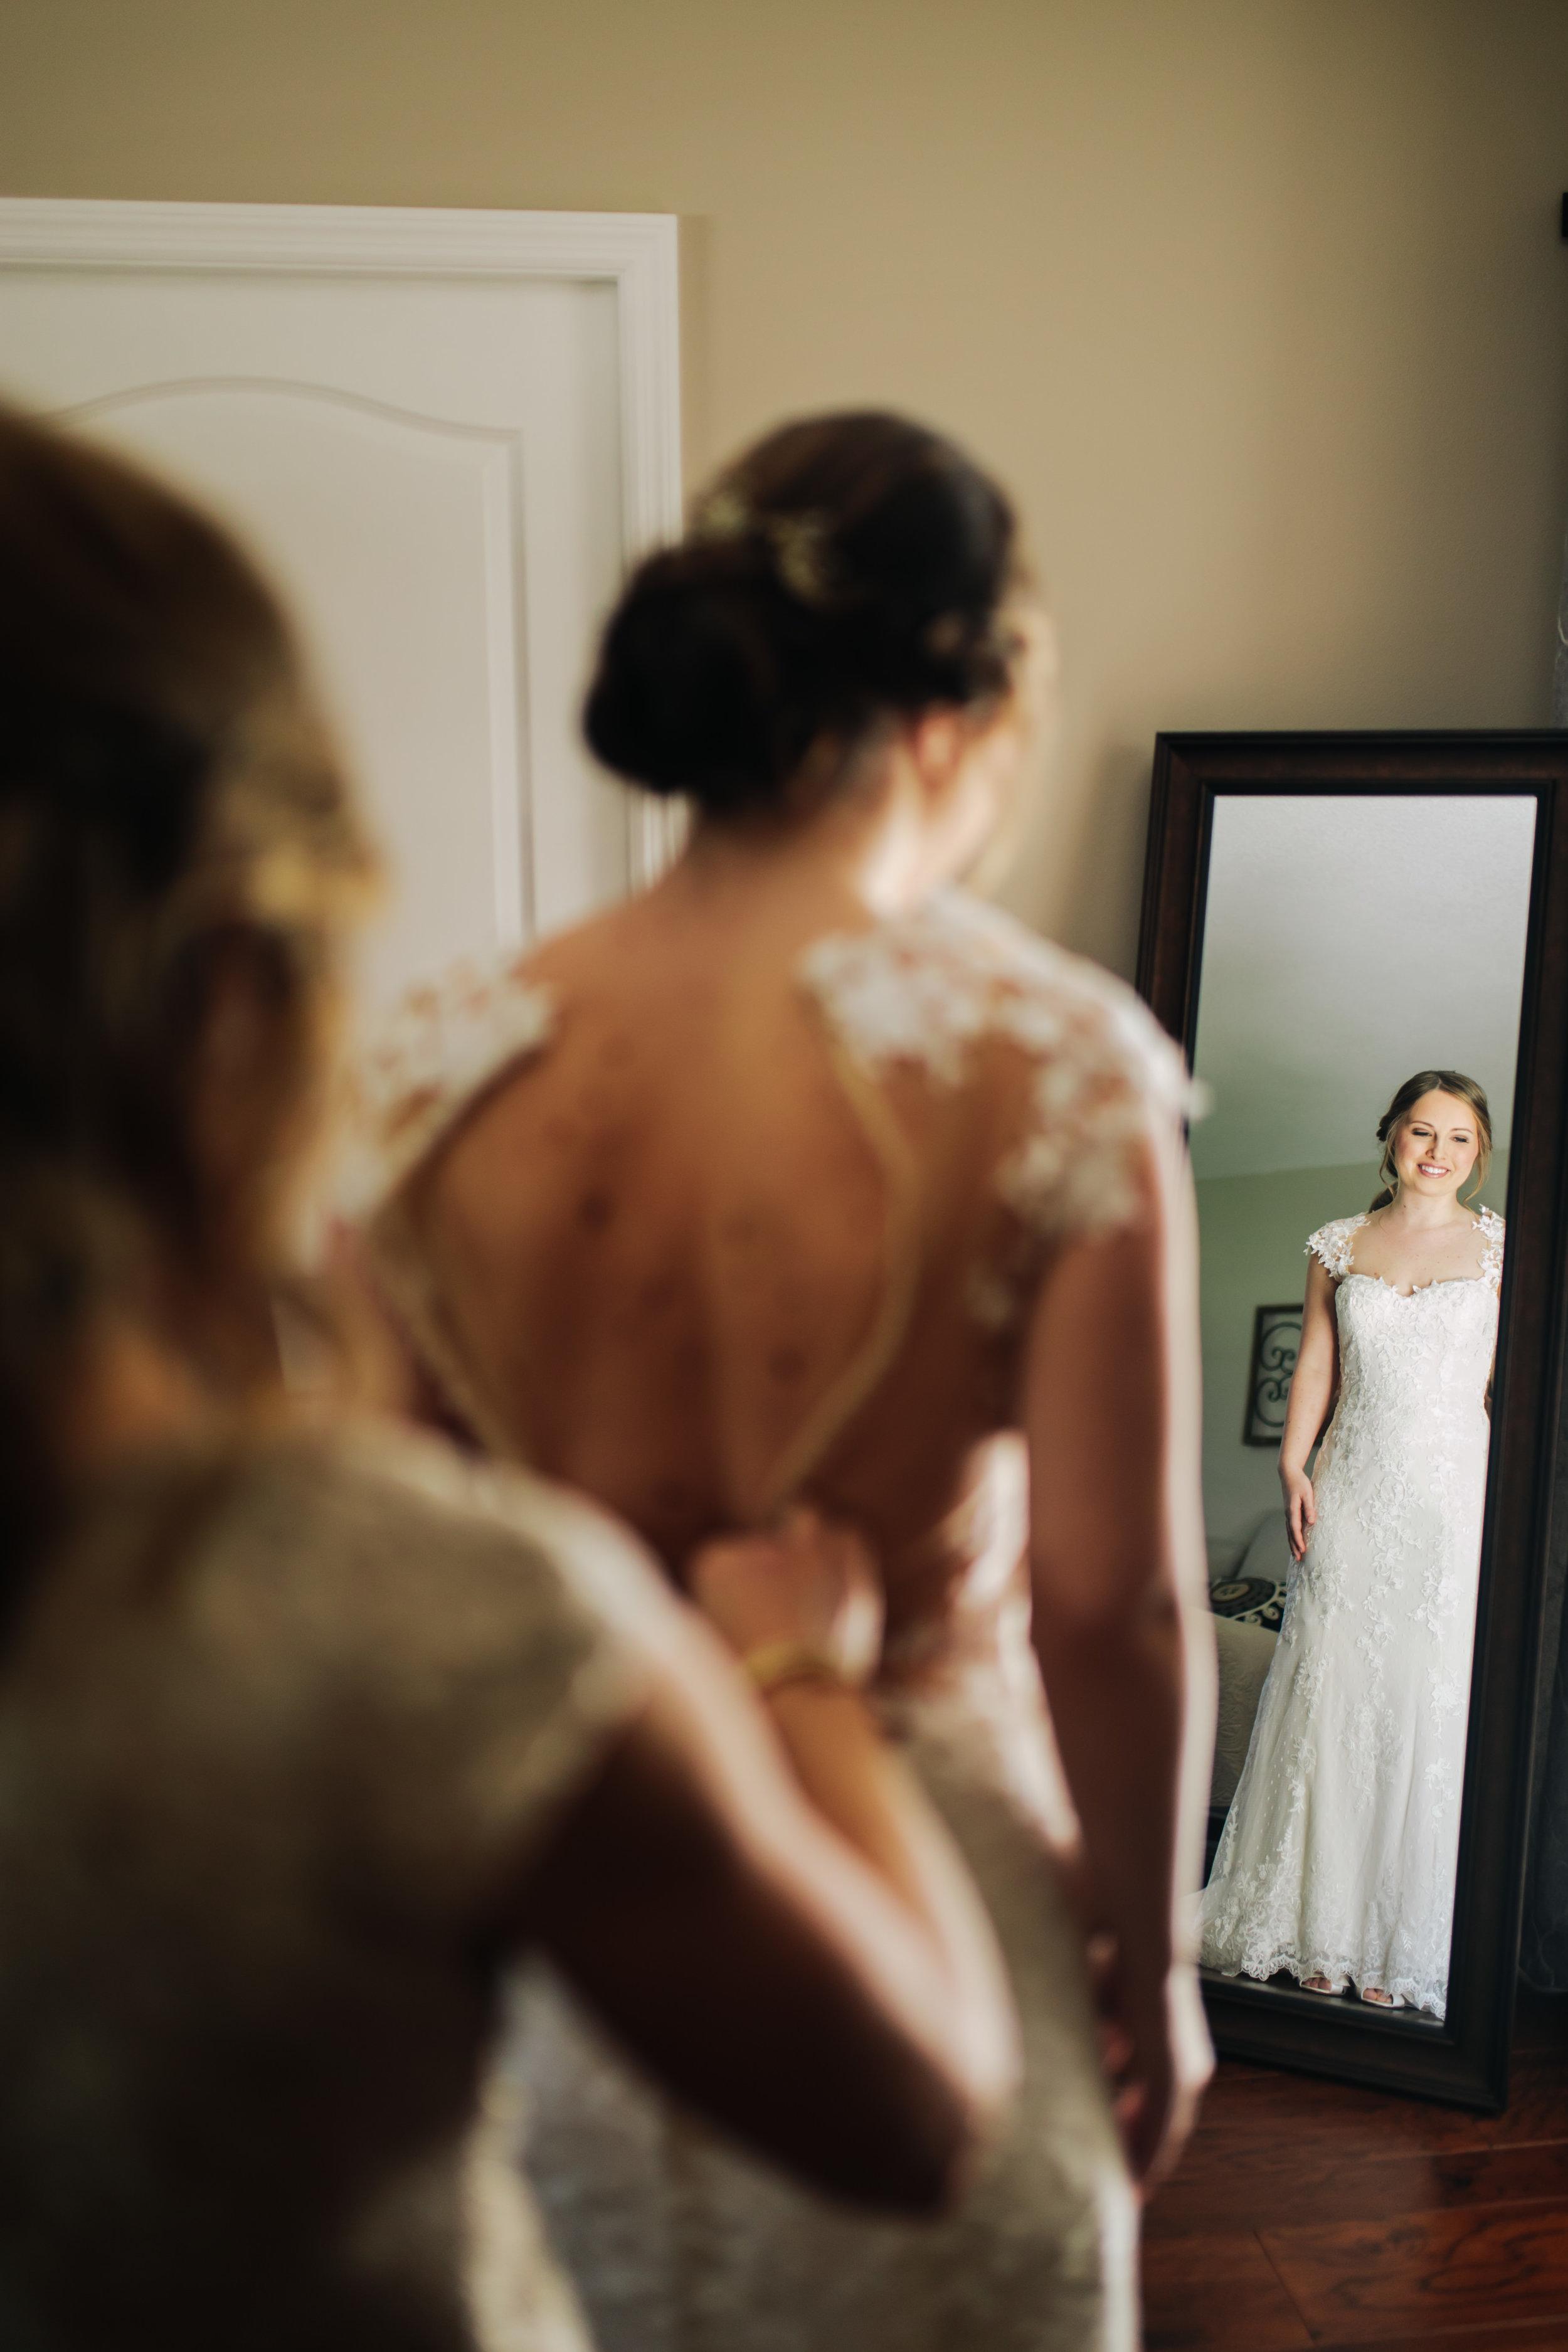 2018.02.17 Whitney and Joe Meyer Melbourne Wedding (42 of 890).jpg